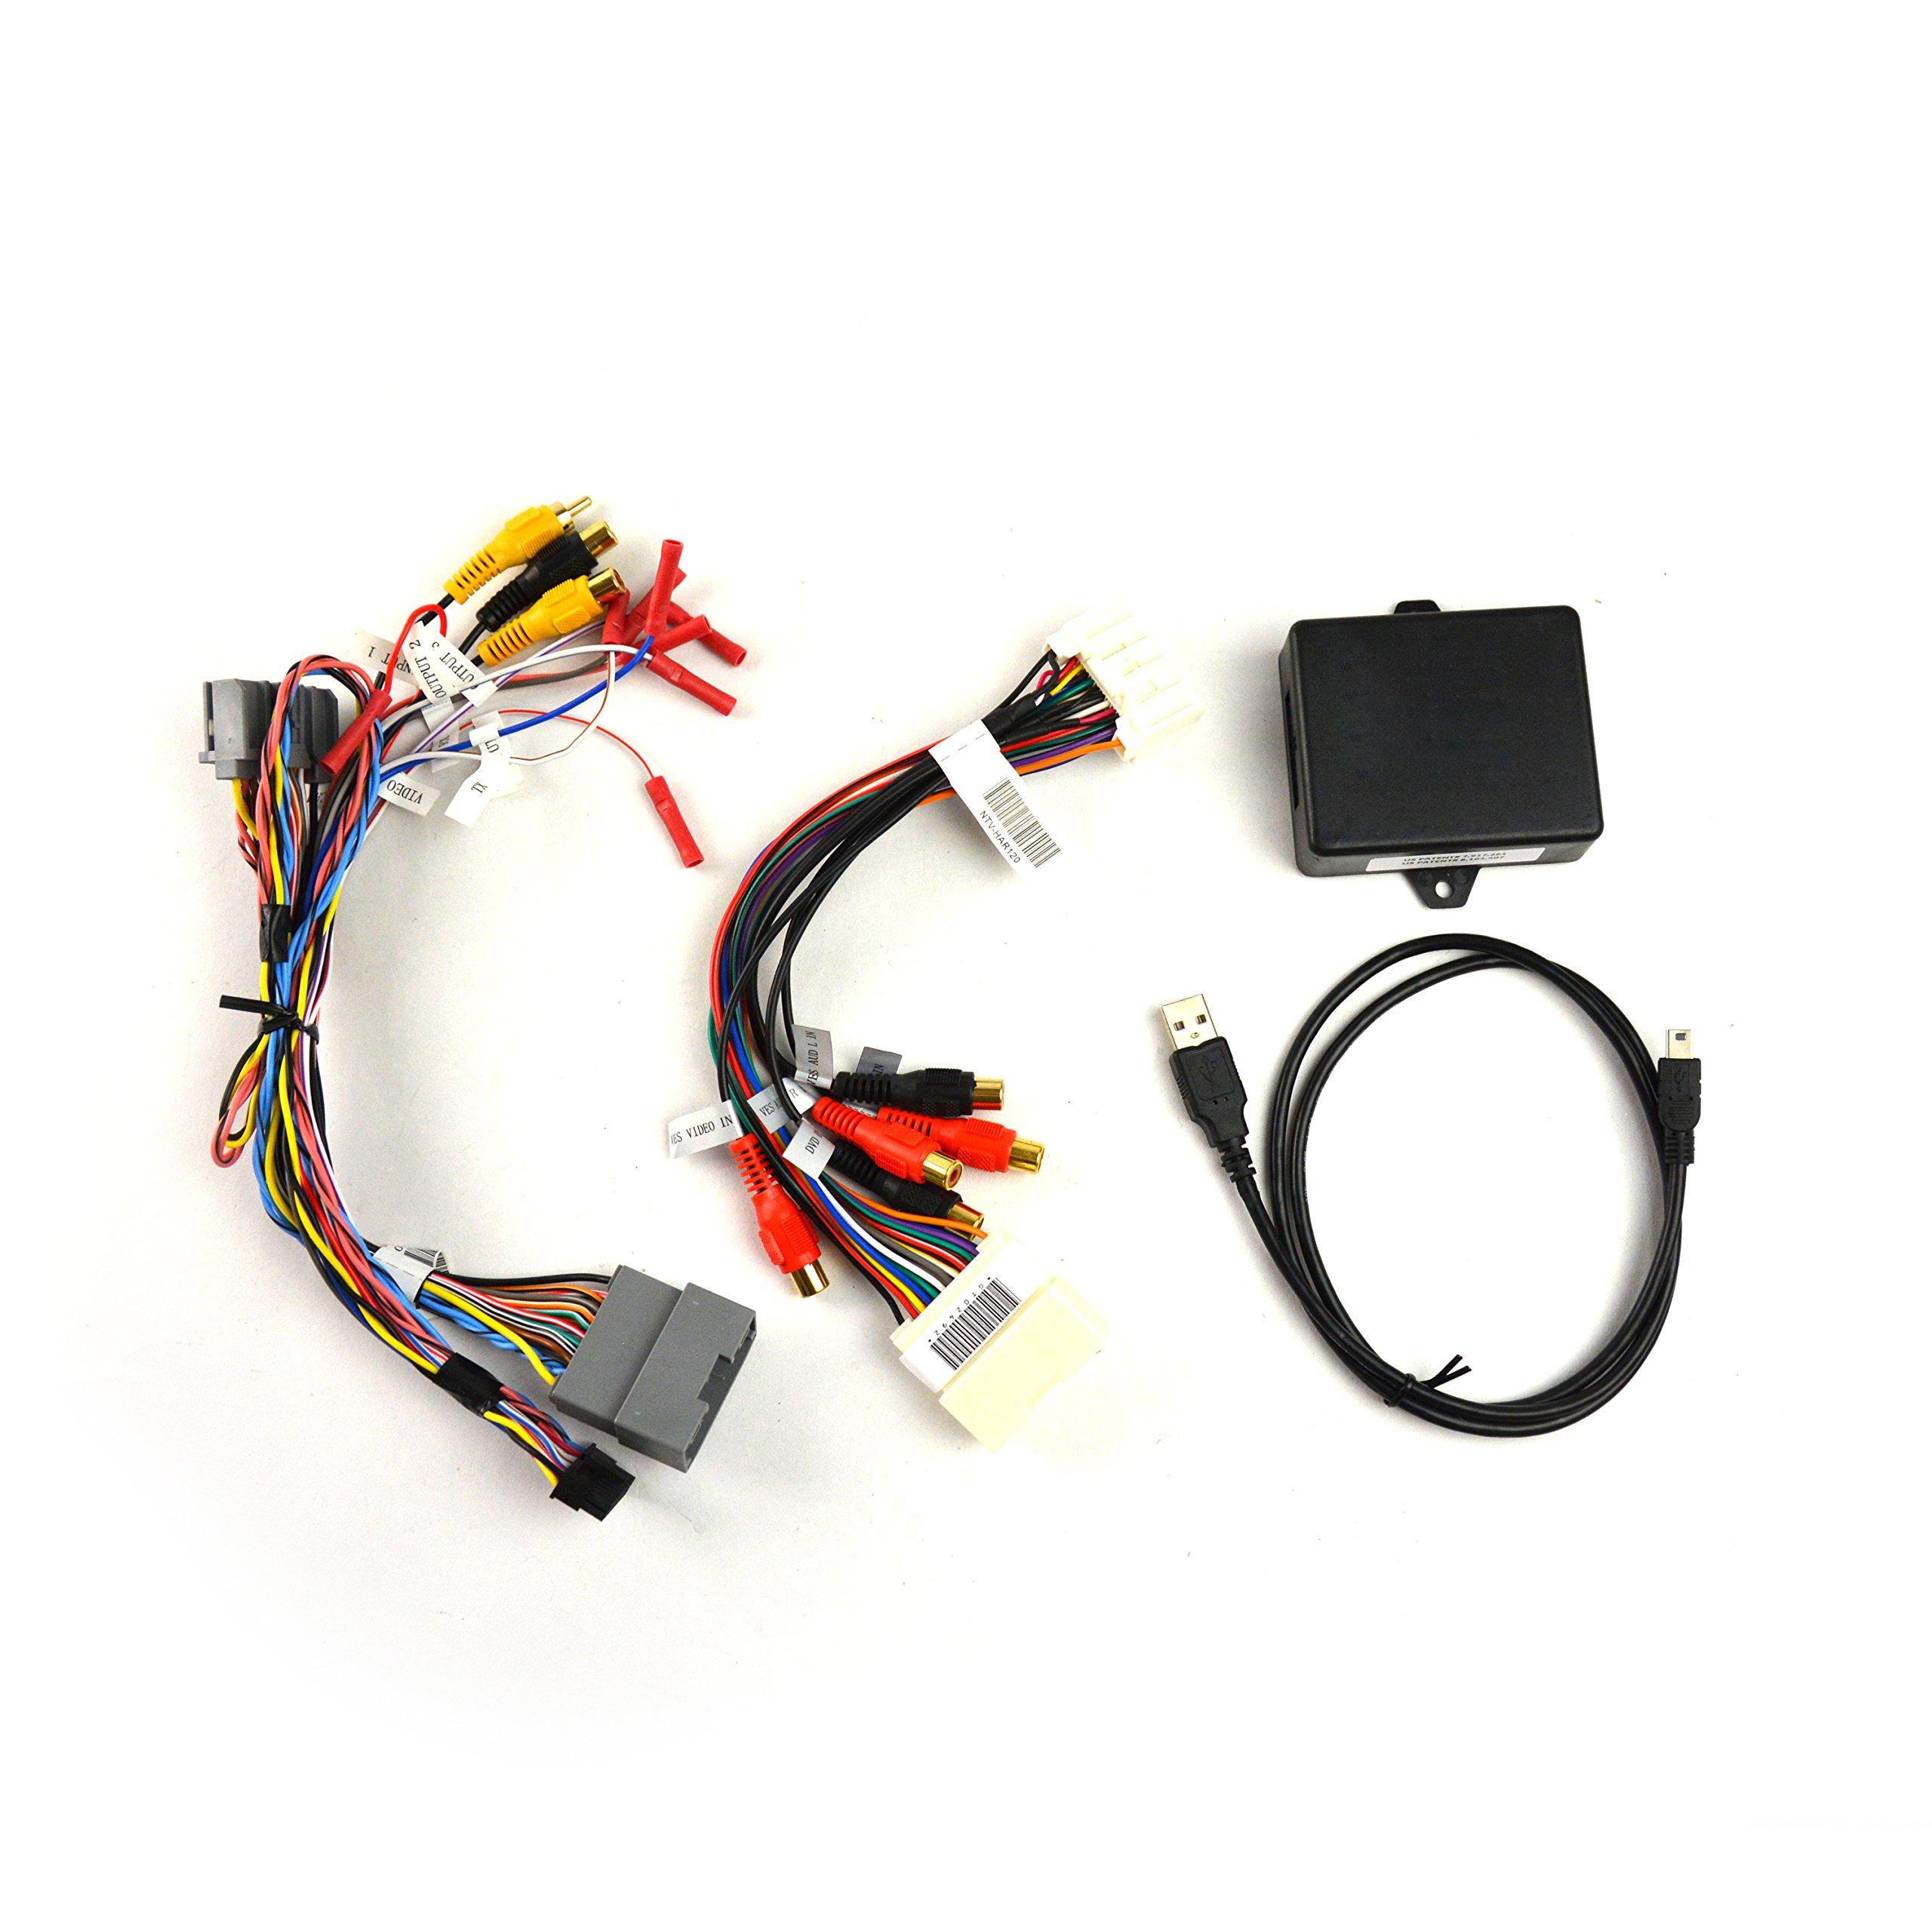 Brandmotion 9002-2782V2 Dual Camera Interface for 6.1'' MyGig Display Radios in Select Jeep, Dodge & Chrysler Vehicles